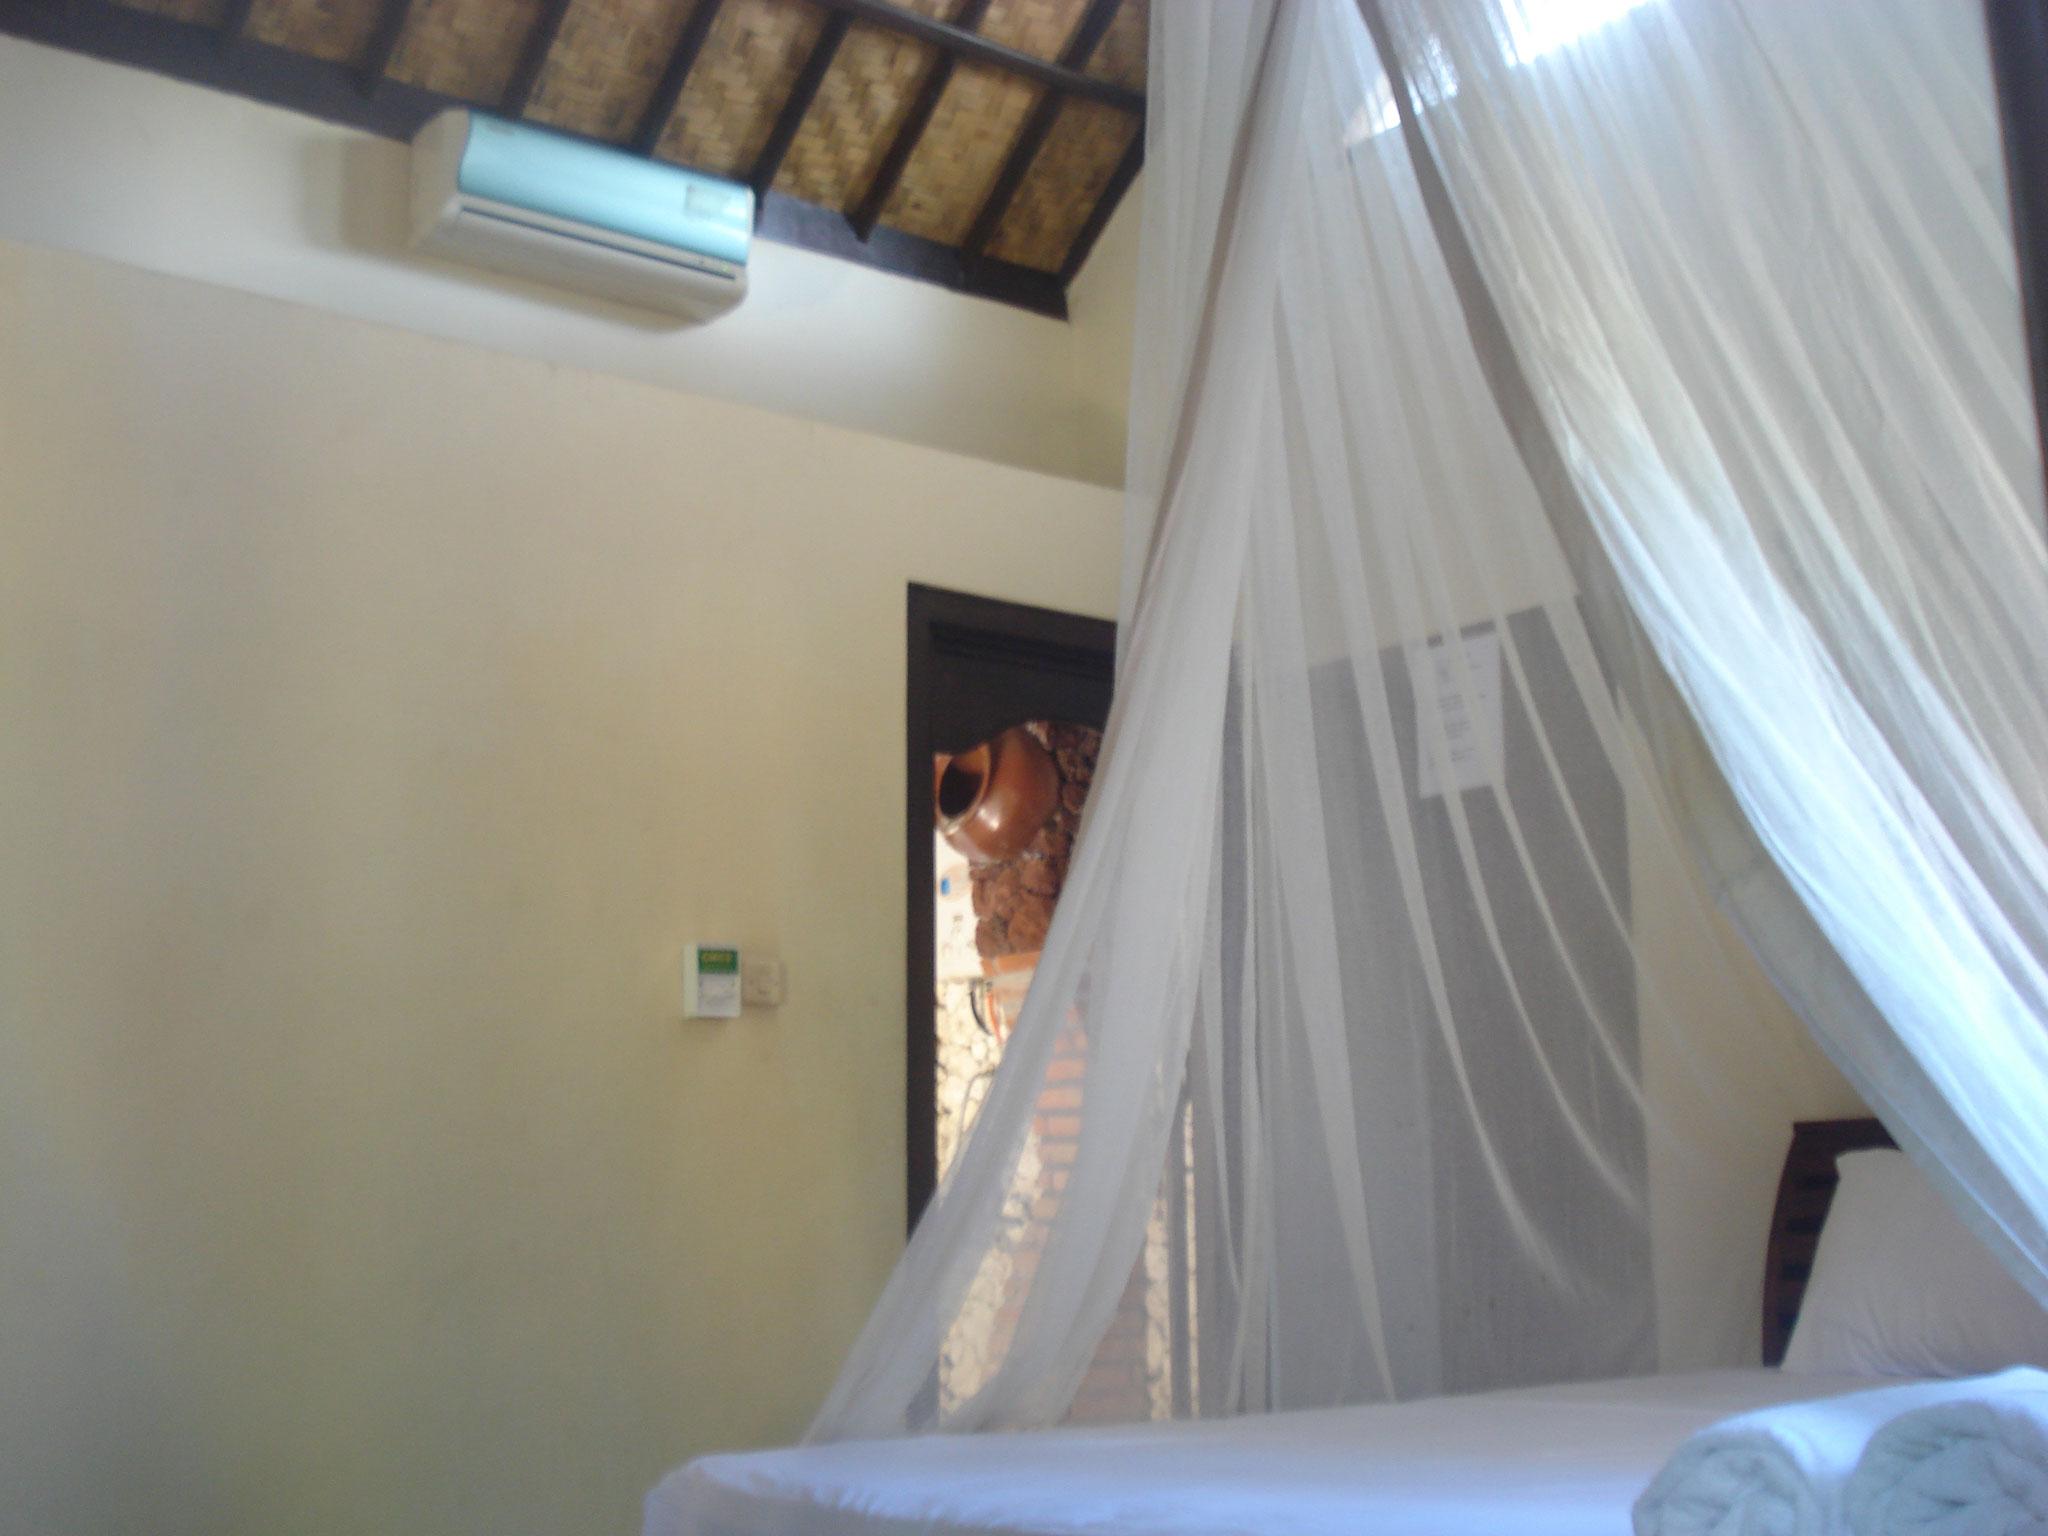 Bulih Beach Bungalows - Room 2 / View to Bathroom